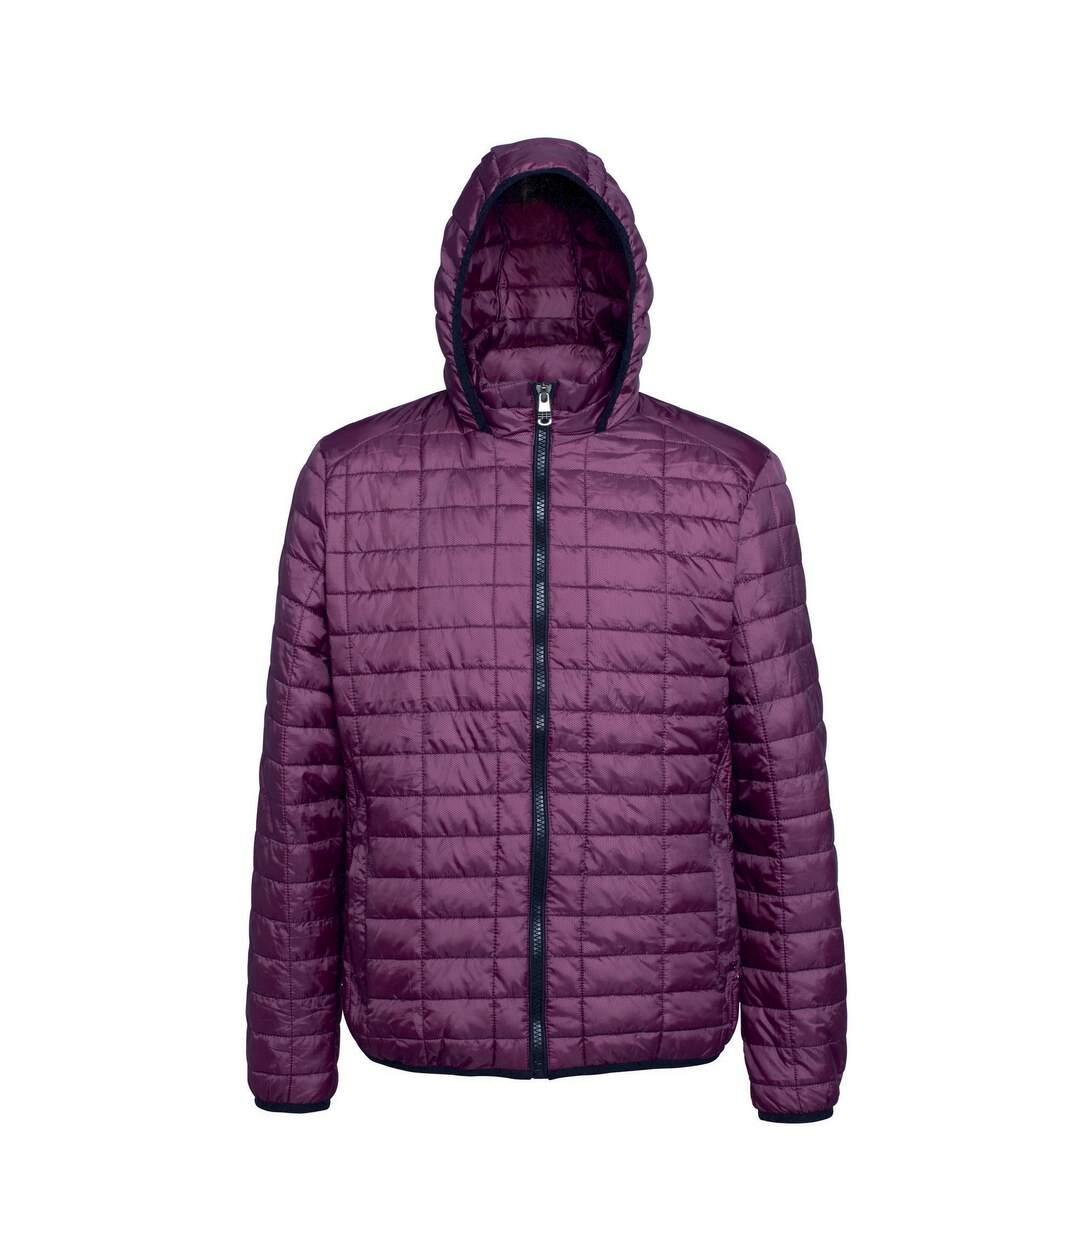 2786 Mens Honeycomb Padded Hooded Jacket (Mulberry) - UTRW5018